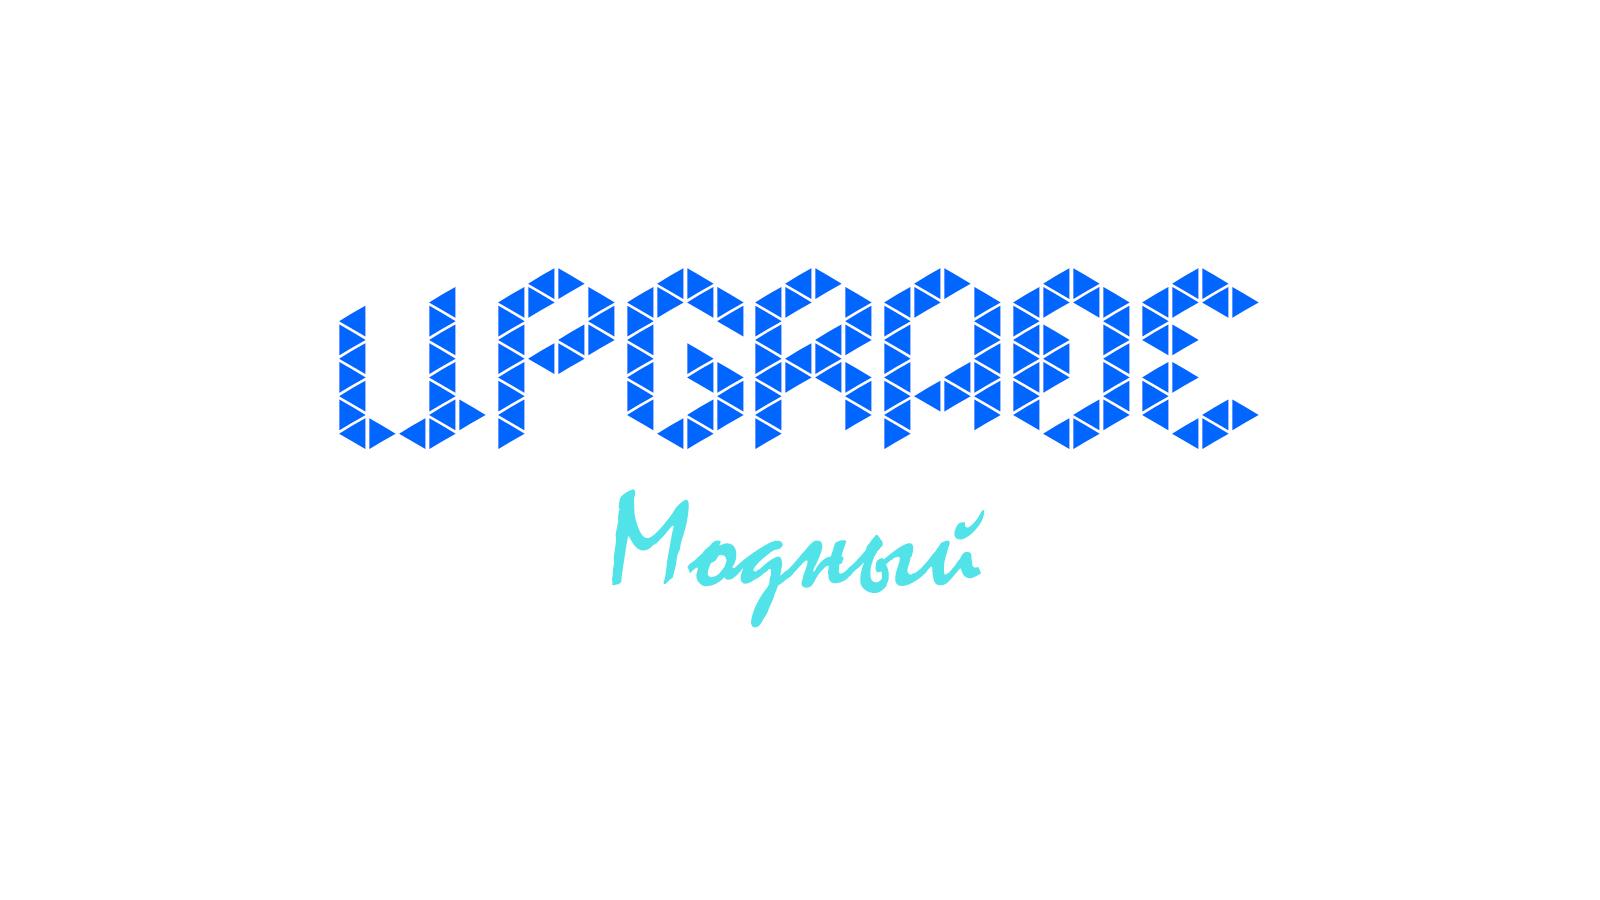 "Логотип интернет магазина ""Модный UPGRADE"" фото f_4695945d8e64843f.jpg"